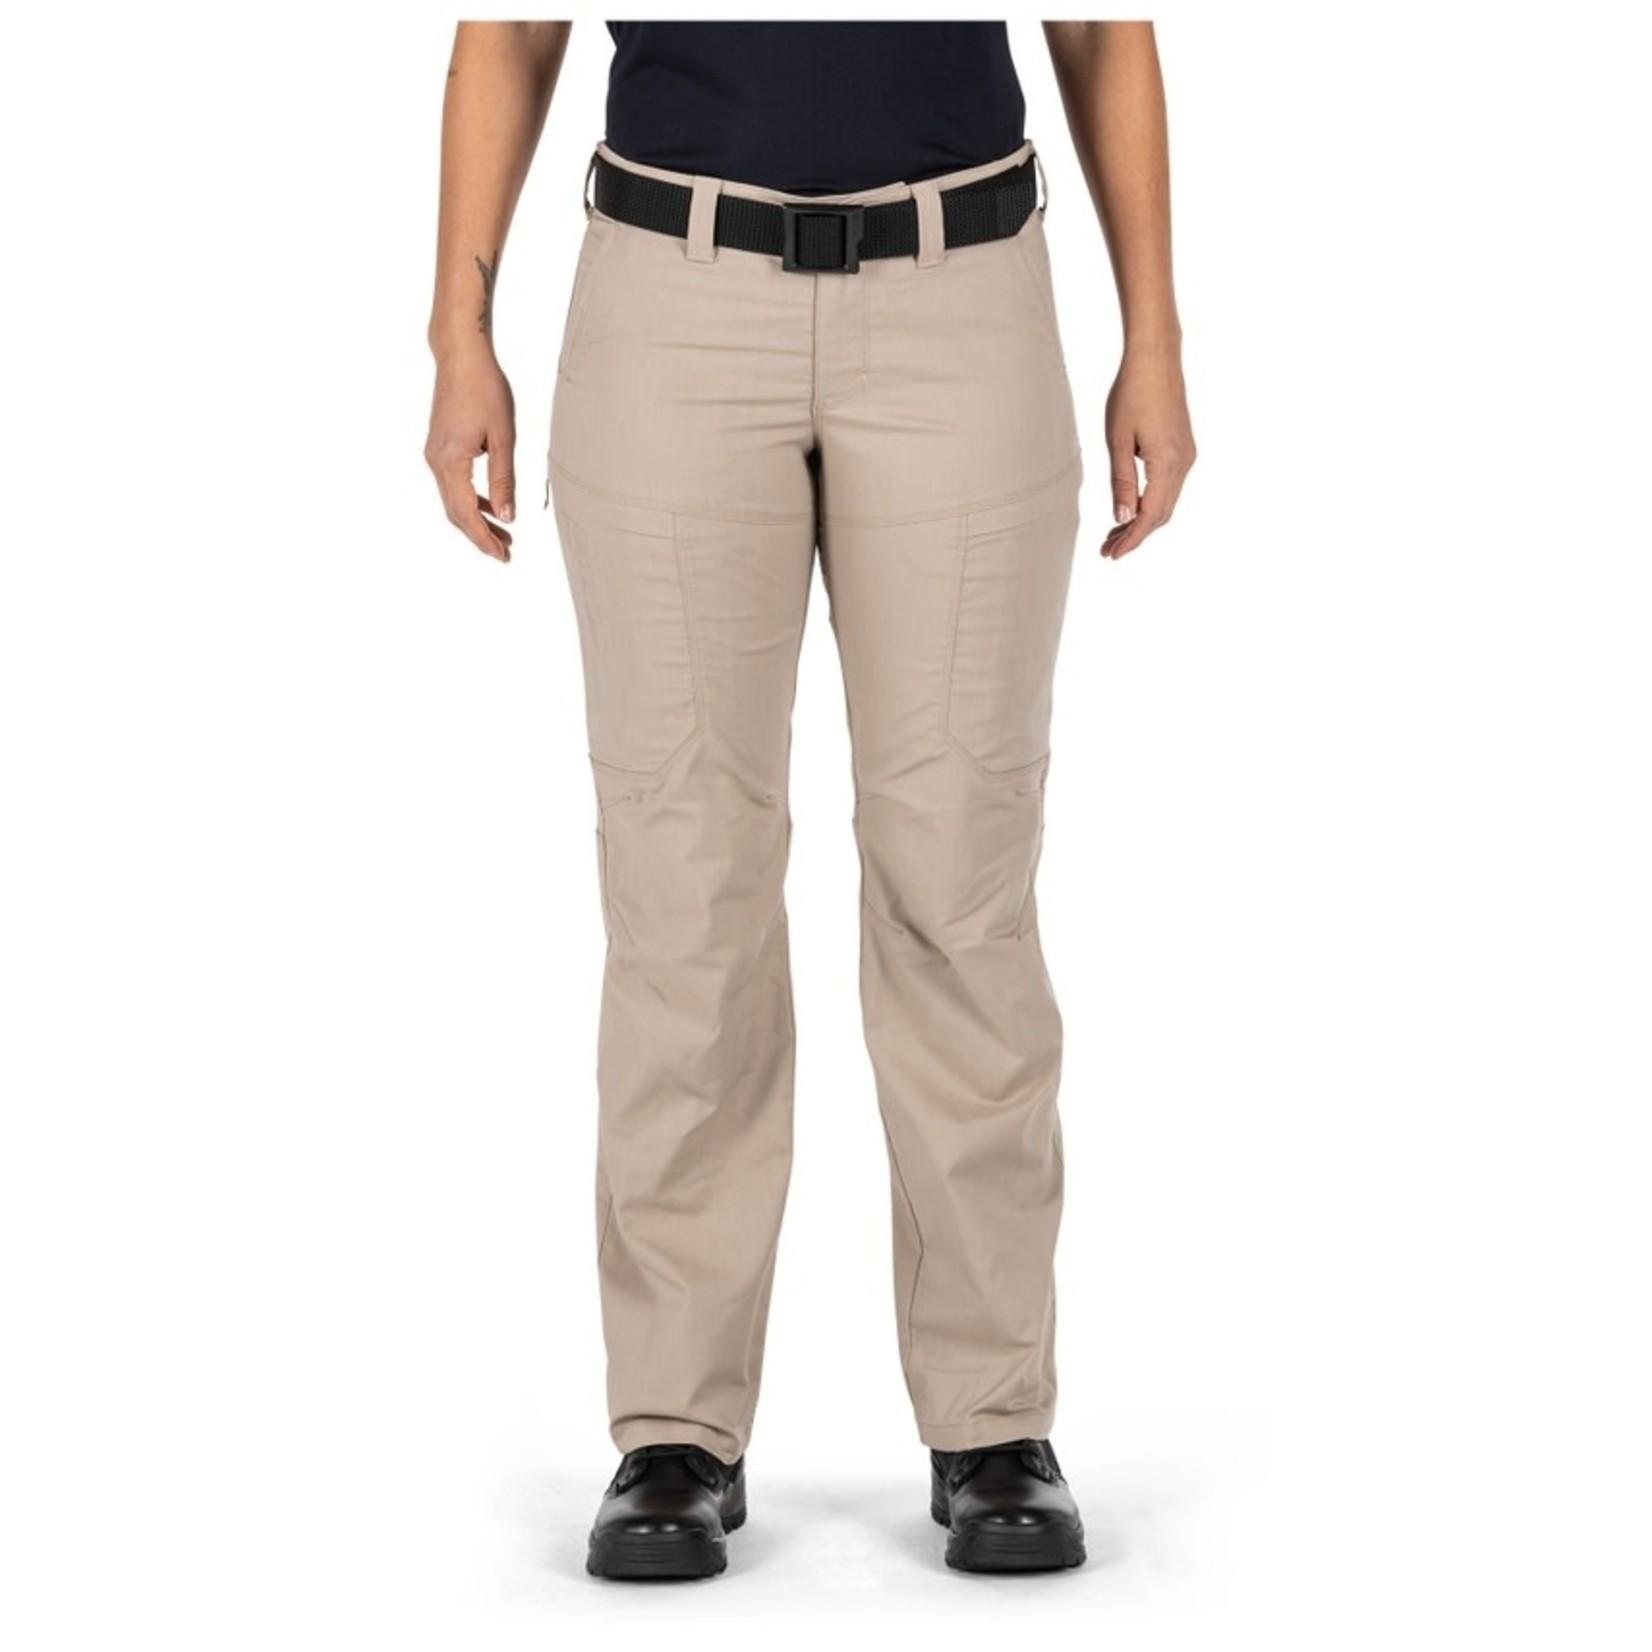 5.11 Tactical 5.11 Women's Apex Pants